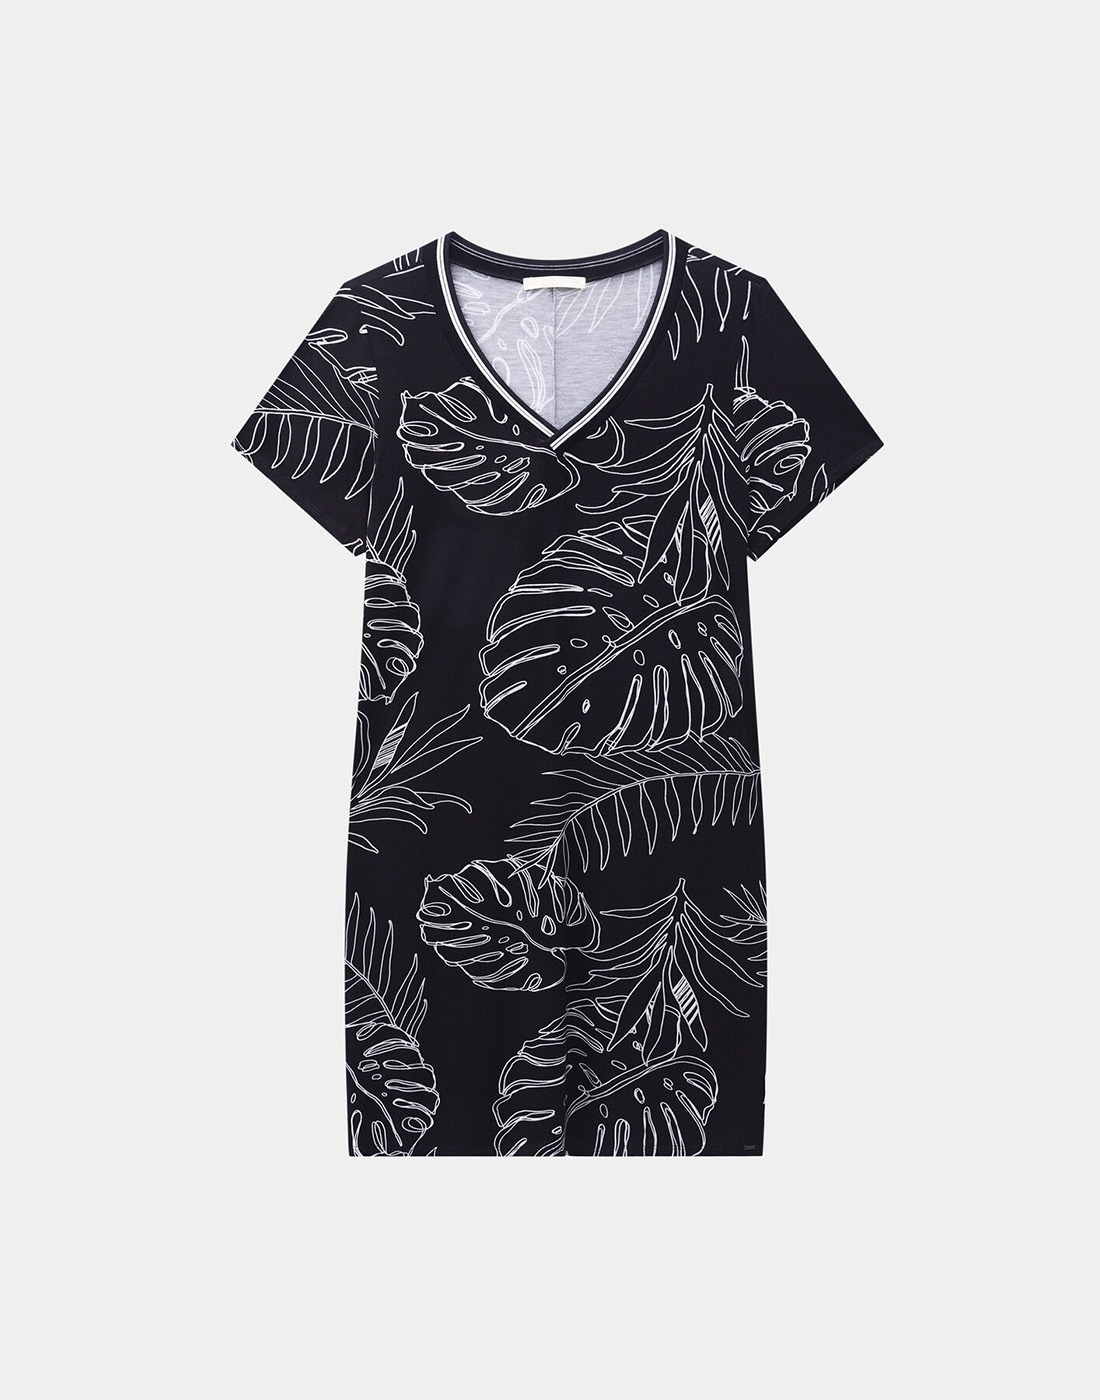 Vestido Decote V Plus Size Malha Viscose Preto Reativo Lunender Mais Mulher